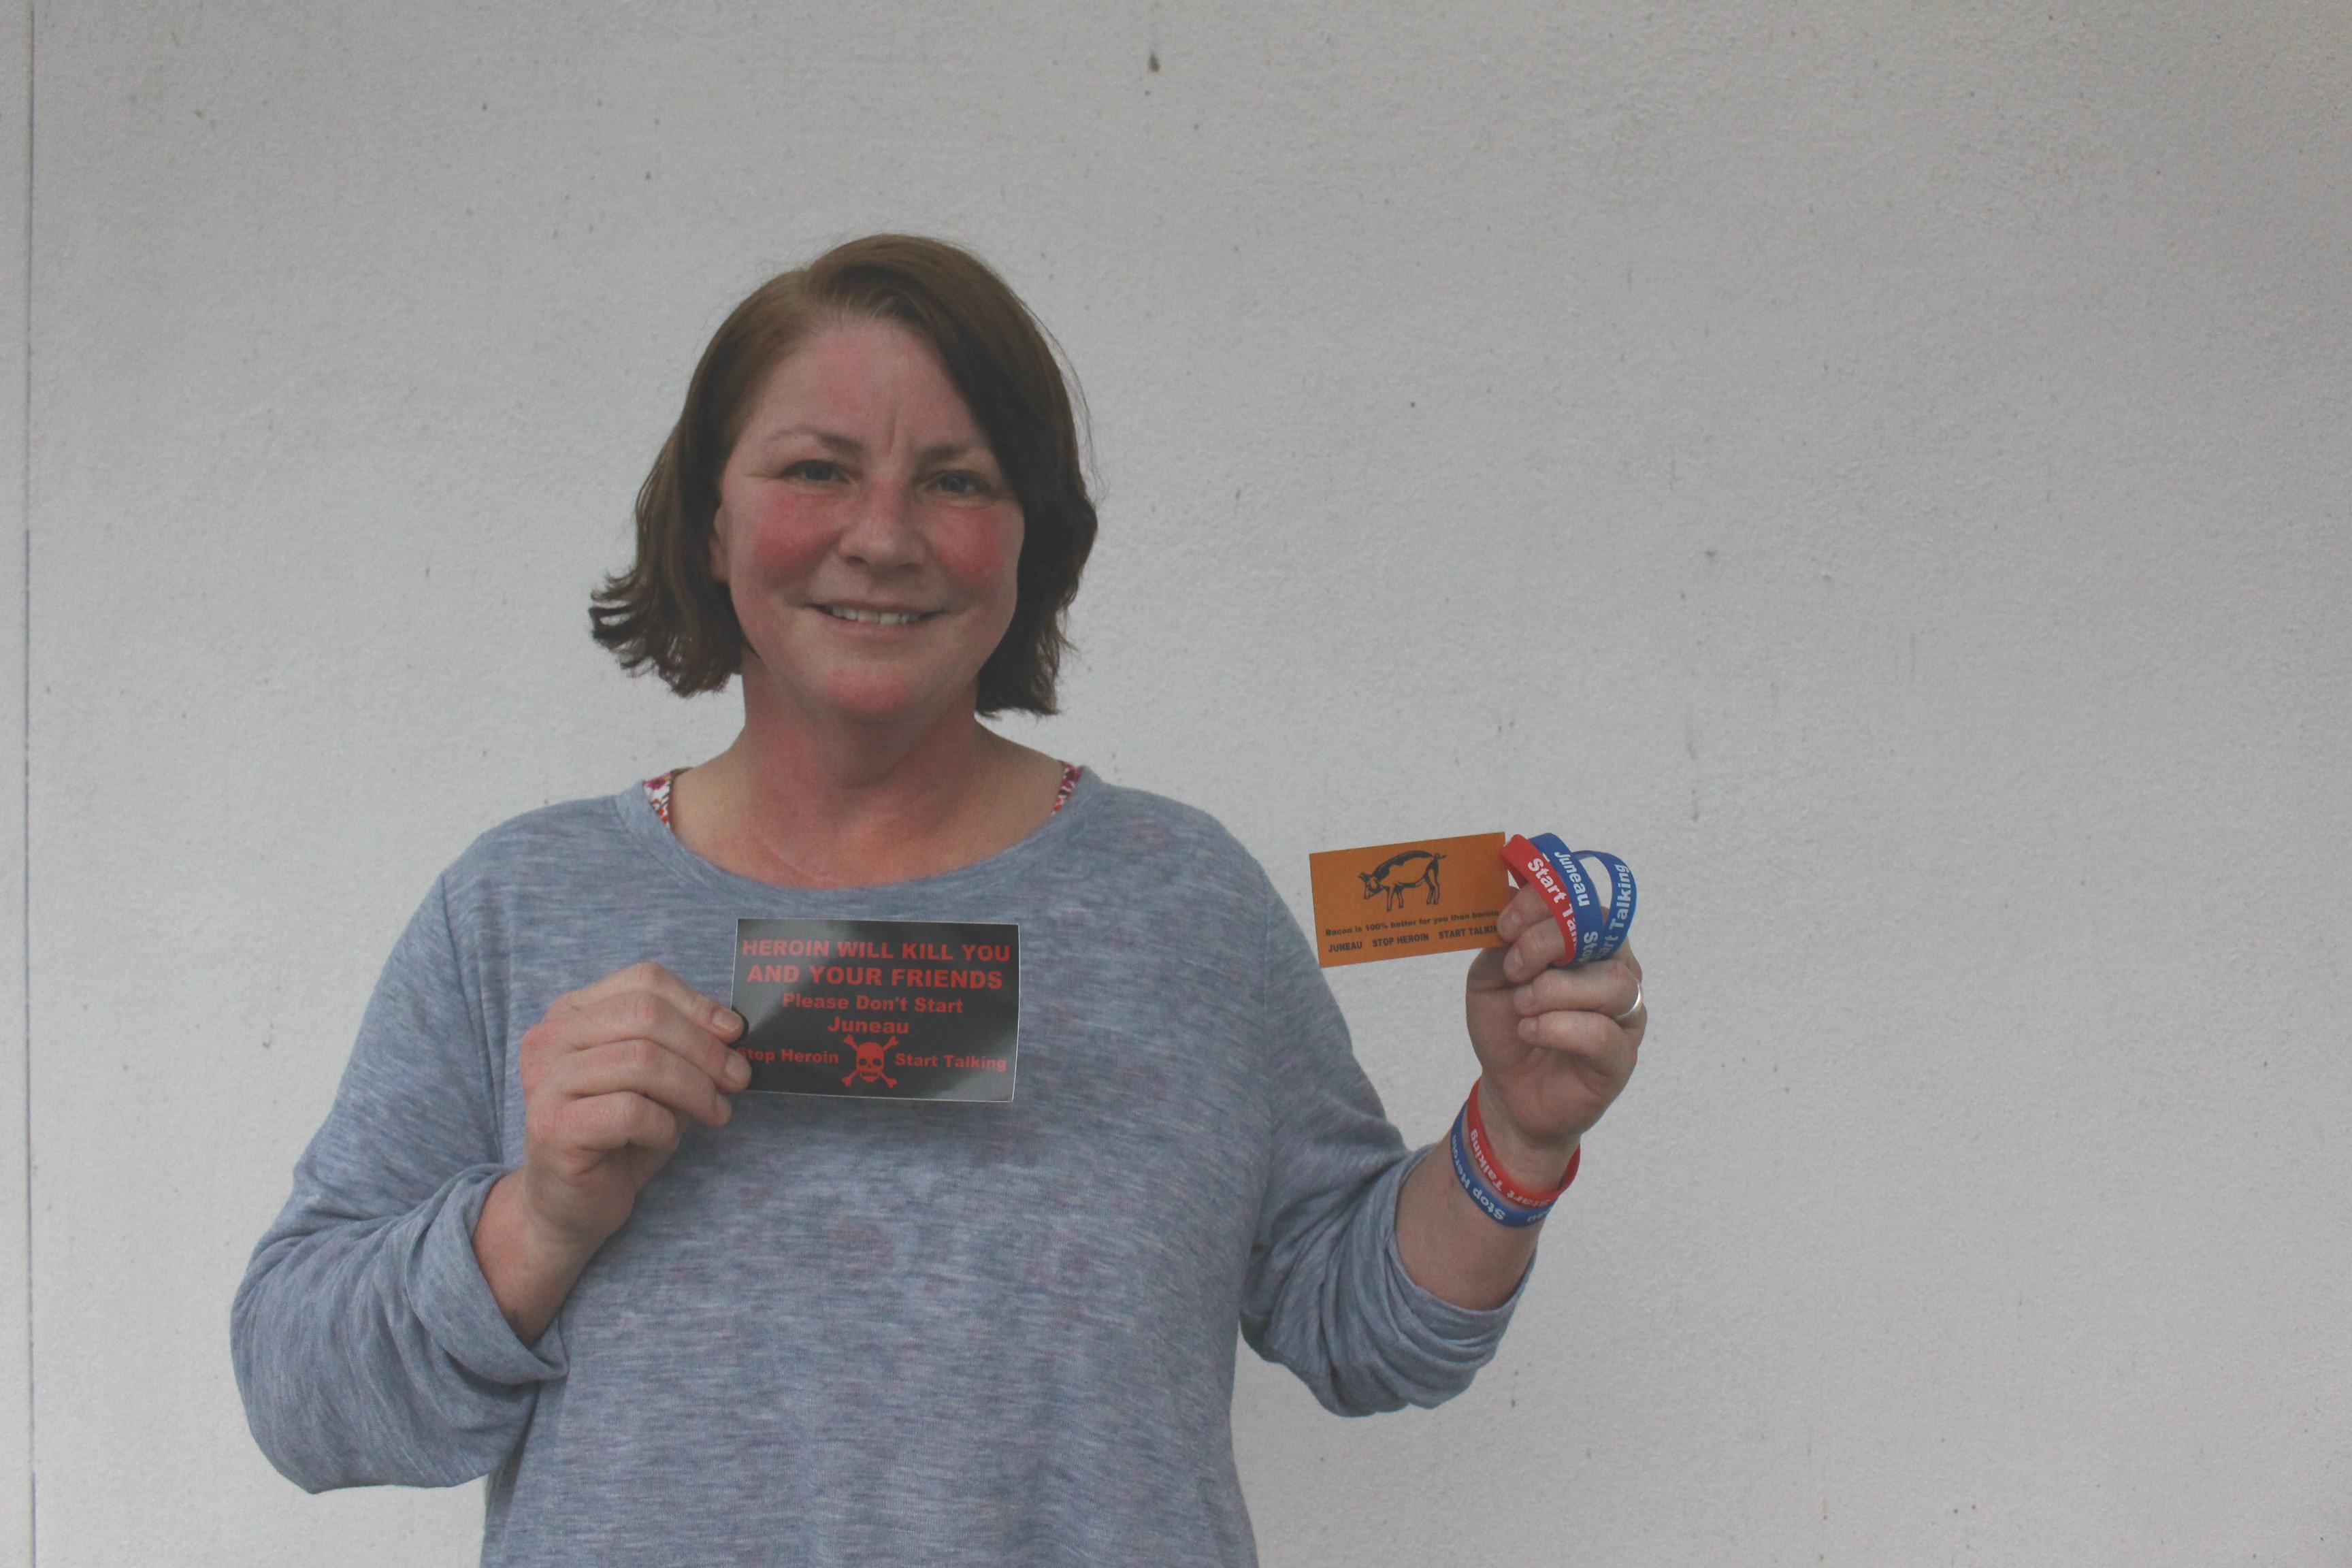 Michele Stuart is organizing the Stop Heroin Start, Talking  Event. (Photo by Elizabeth Jenkins)